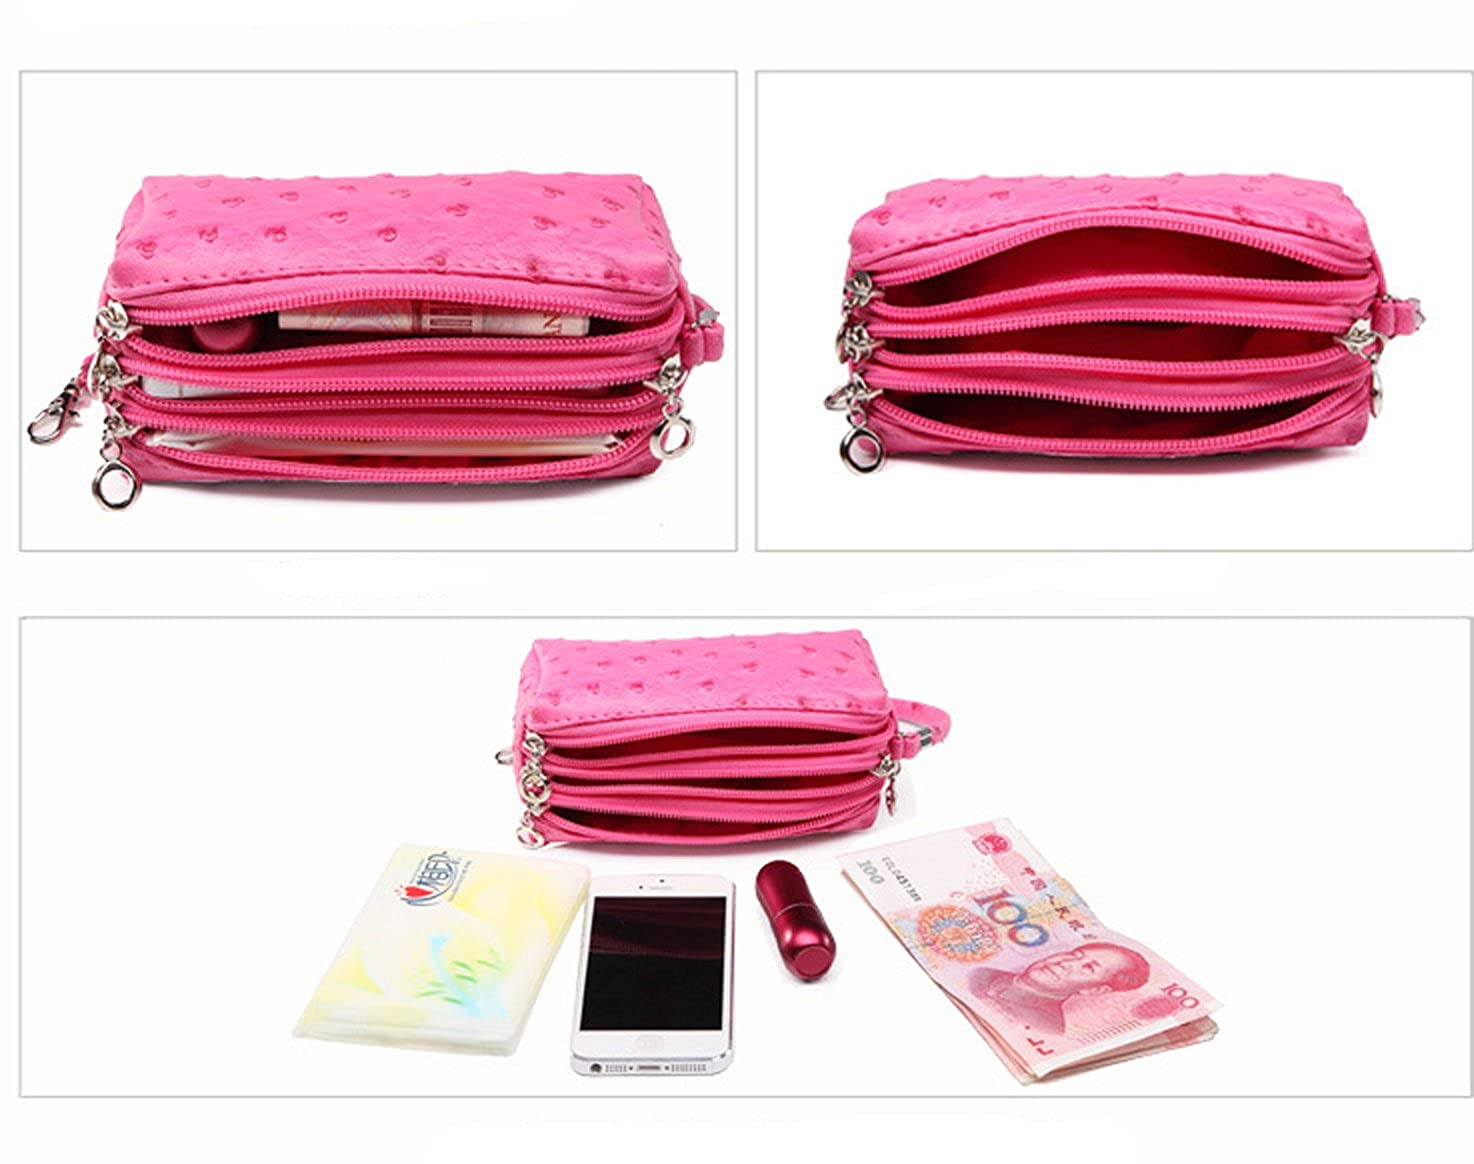 7881b63f650 Micom 2016 New Candy Color Fake Ostrich Leather Three Layers Clutch  Handbags Purse for Women (Khaki)  Handbags  Amazon.com